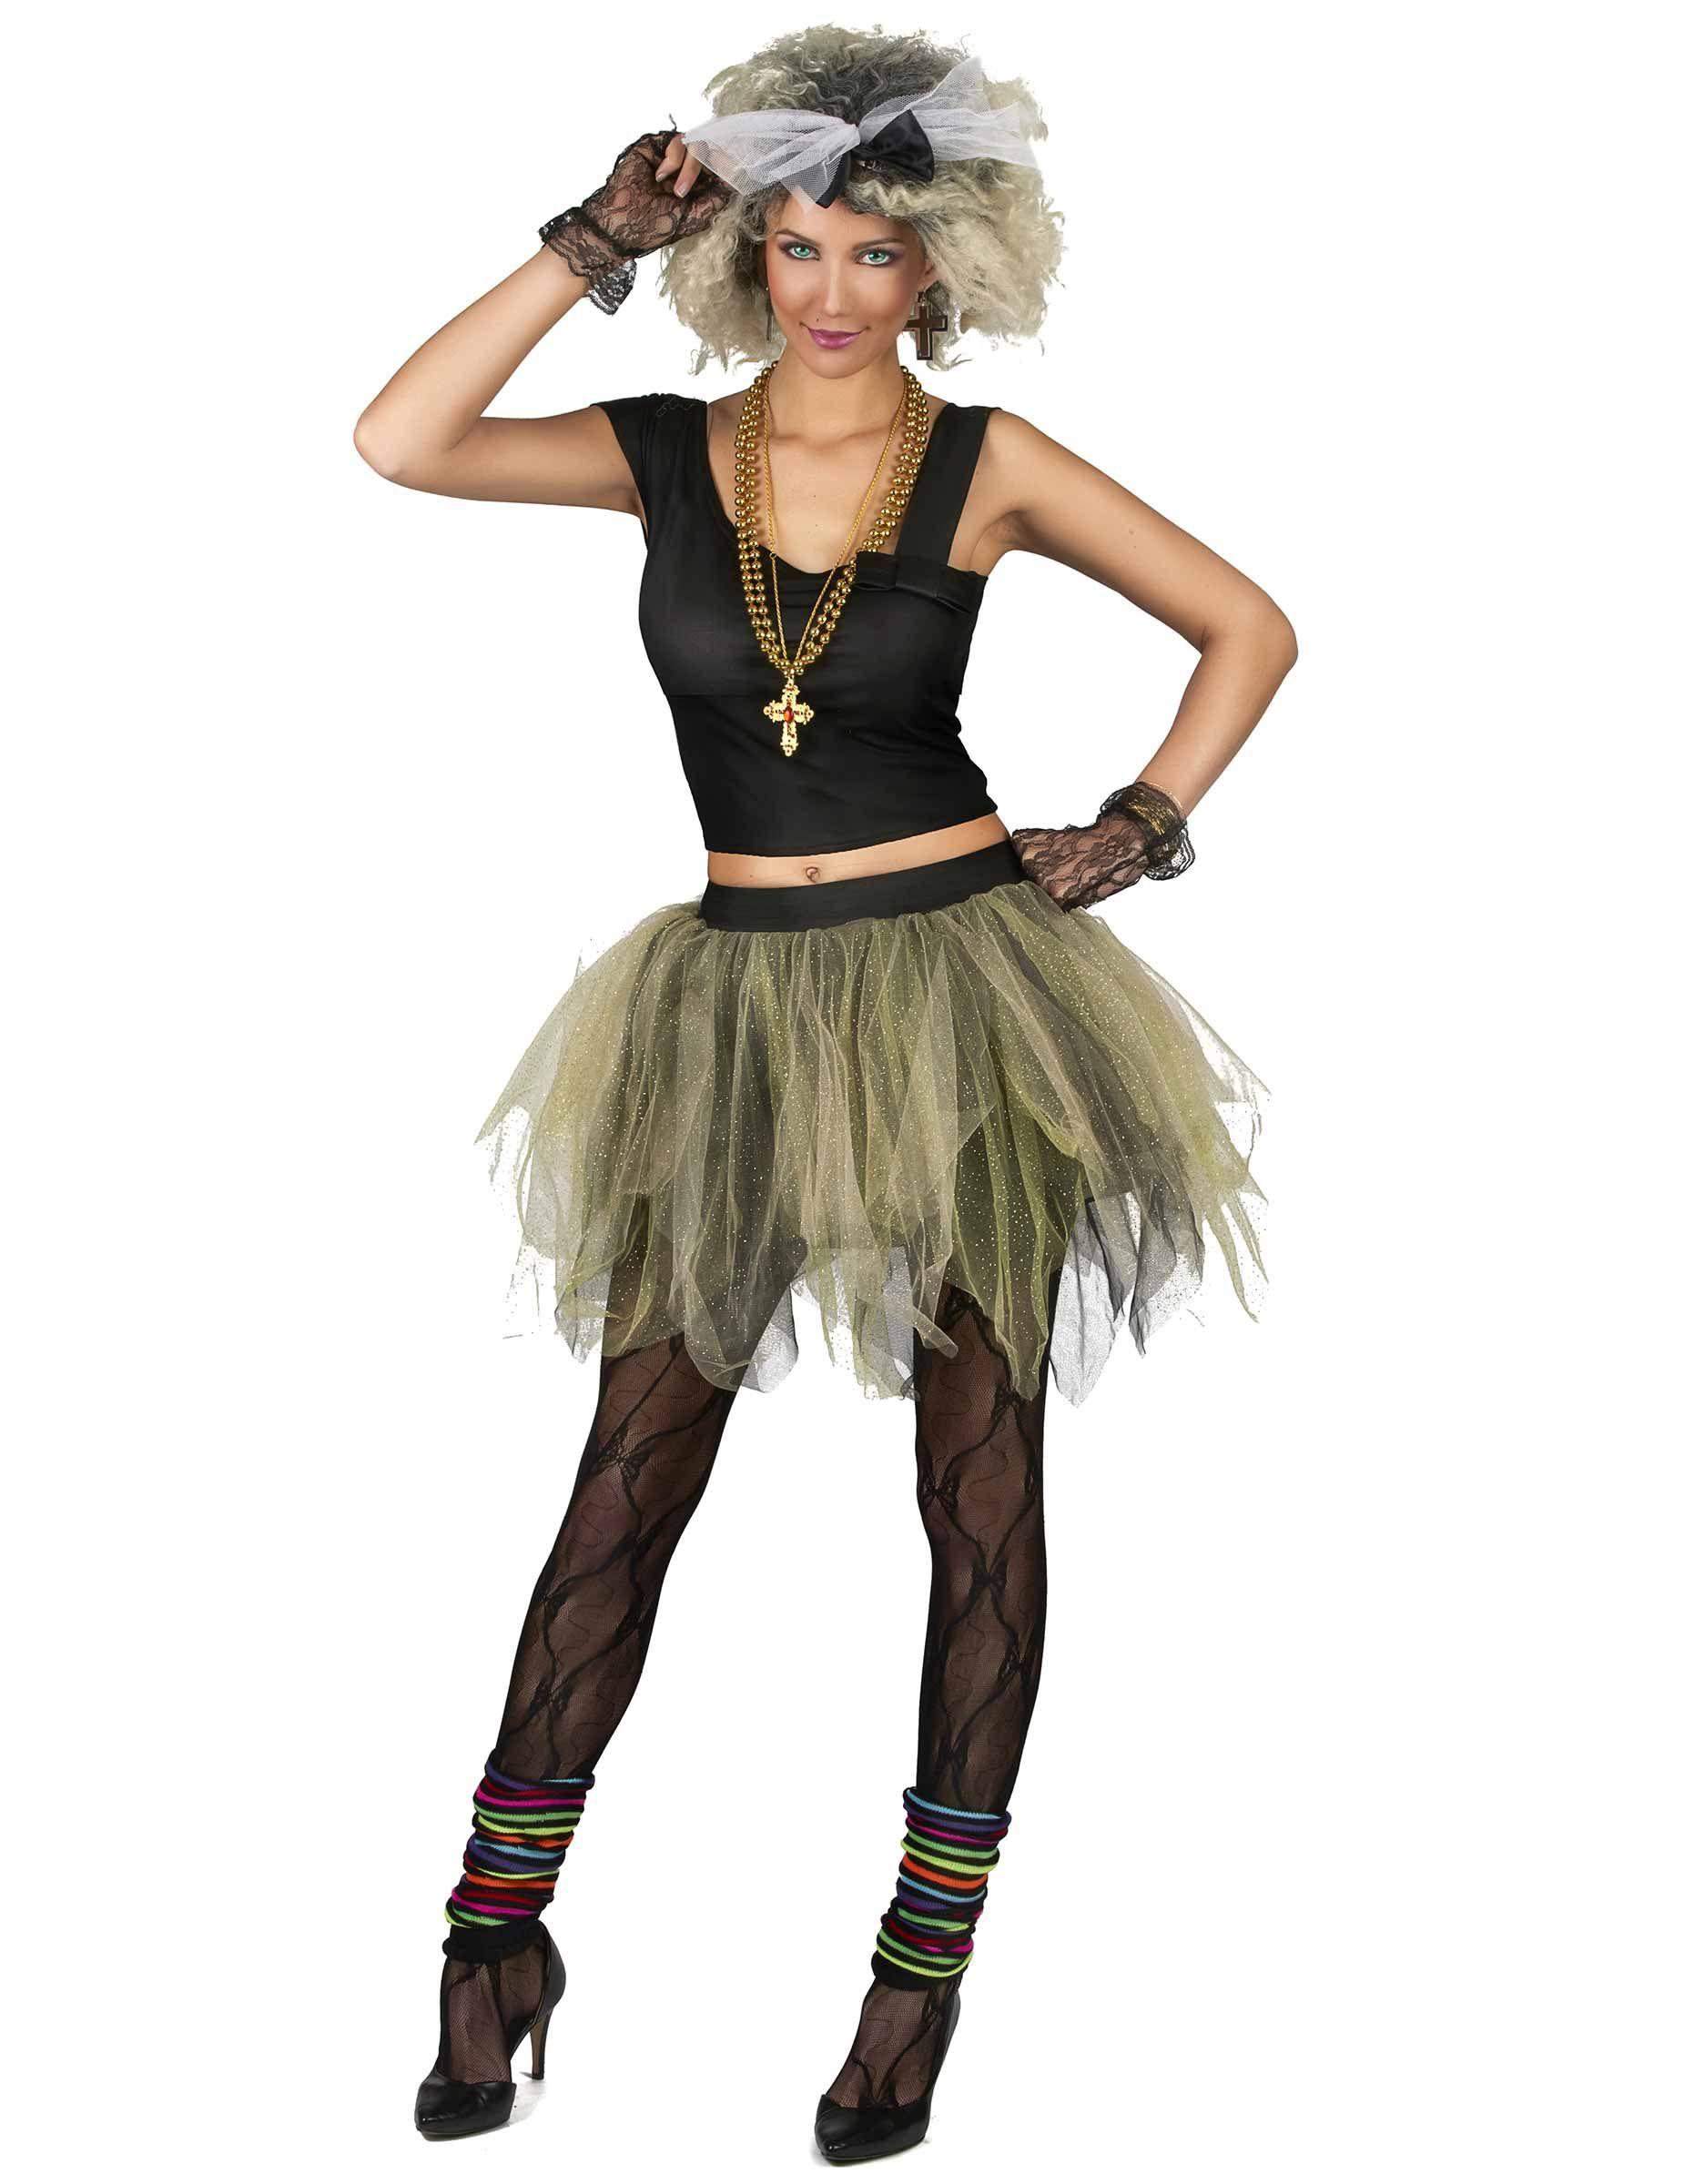 959073b3d33be 80er Disco Popstar Kostüm für Damen in 2019 | Fasching | Disco ...